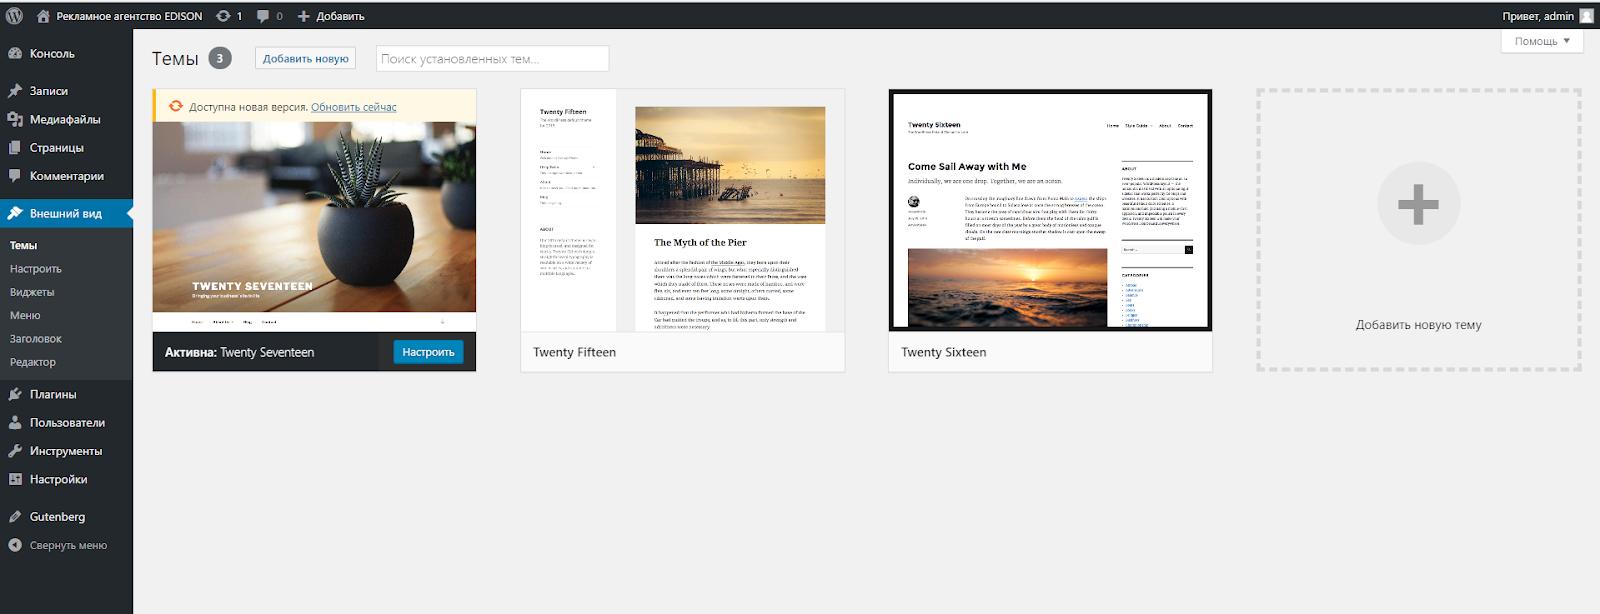 Раздел темы в Wordpress